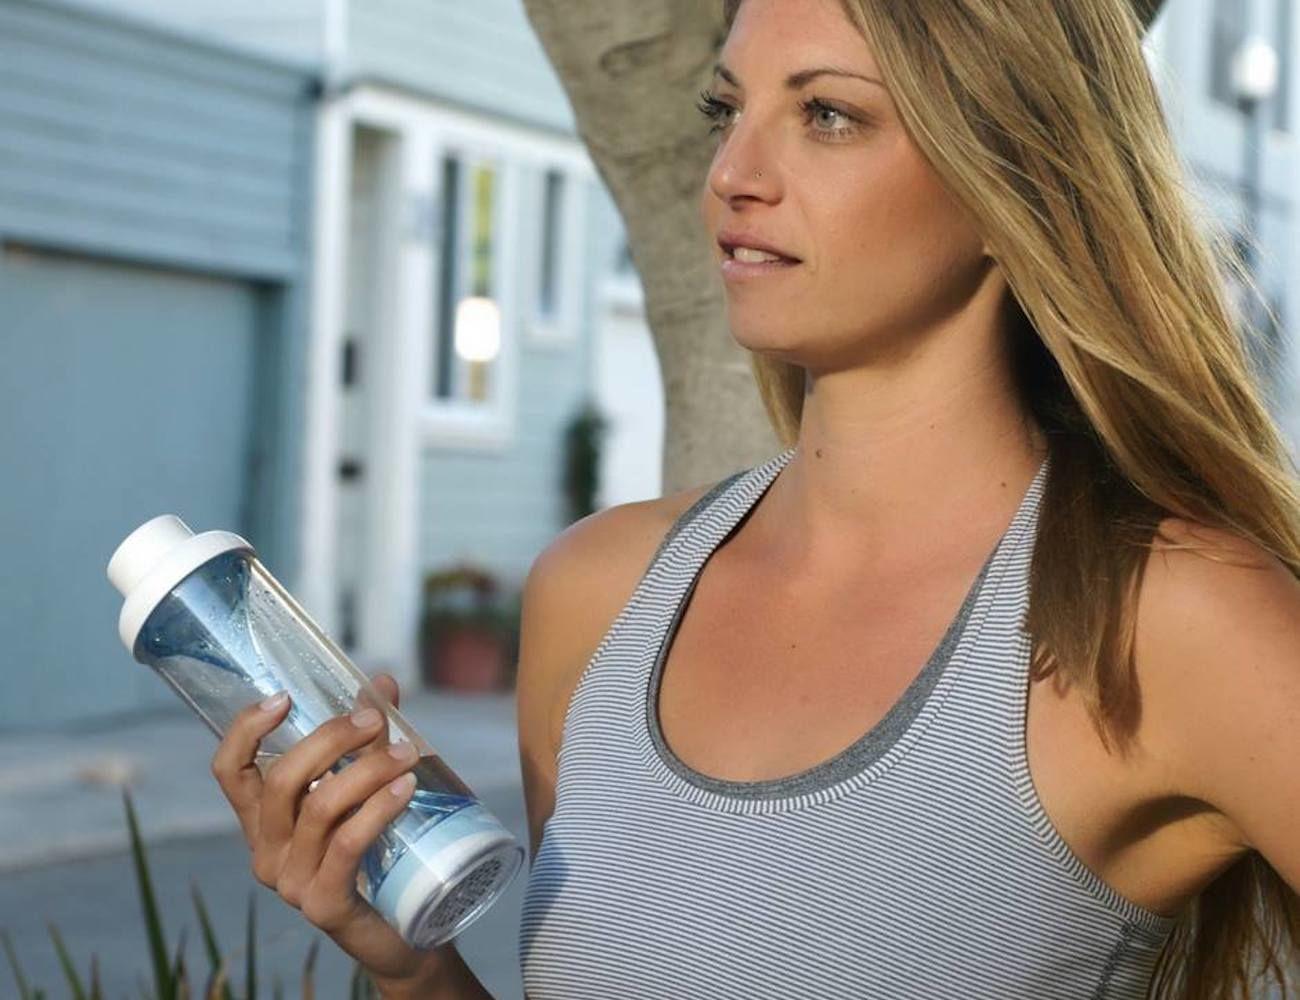 321 Reusable Filtering Water Bottle